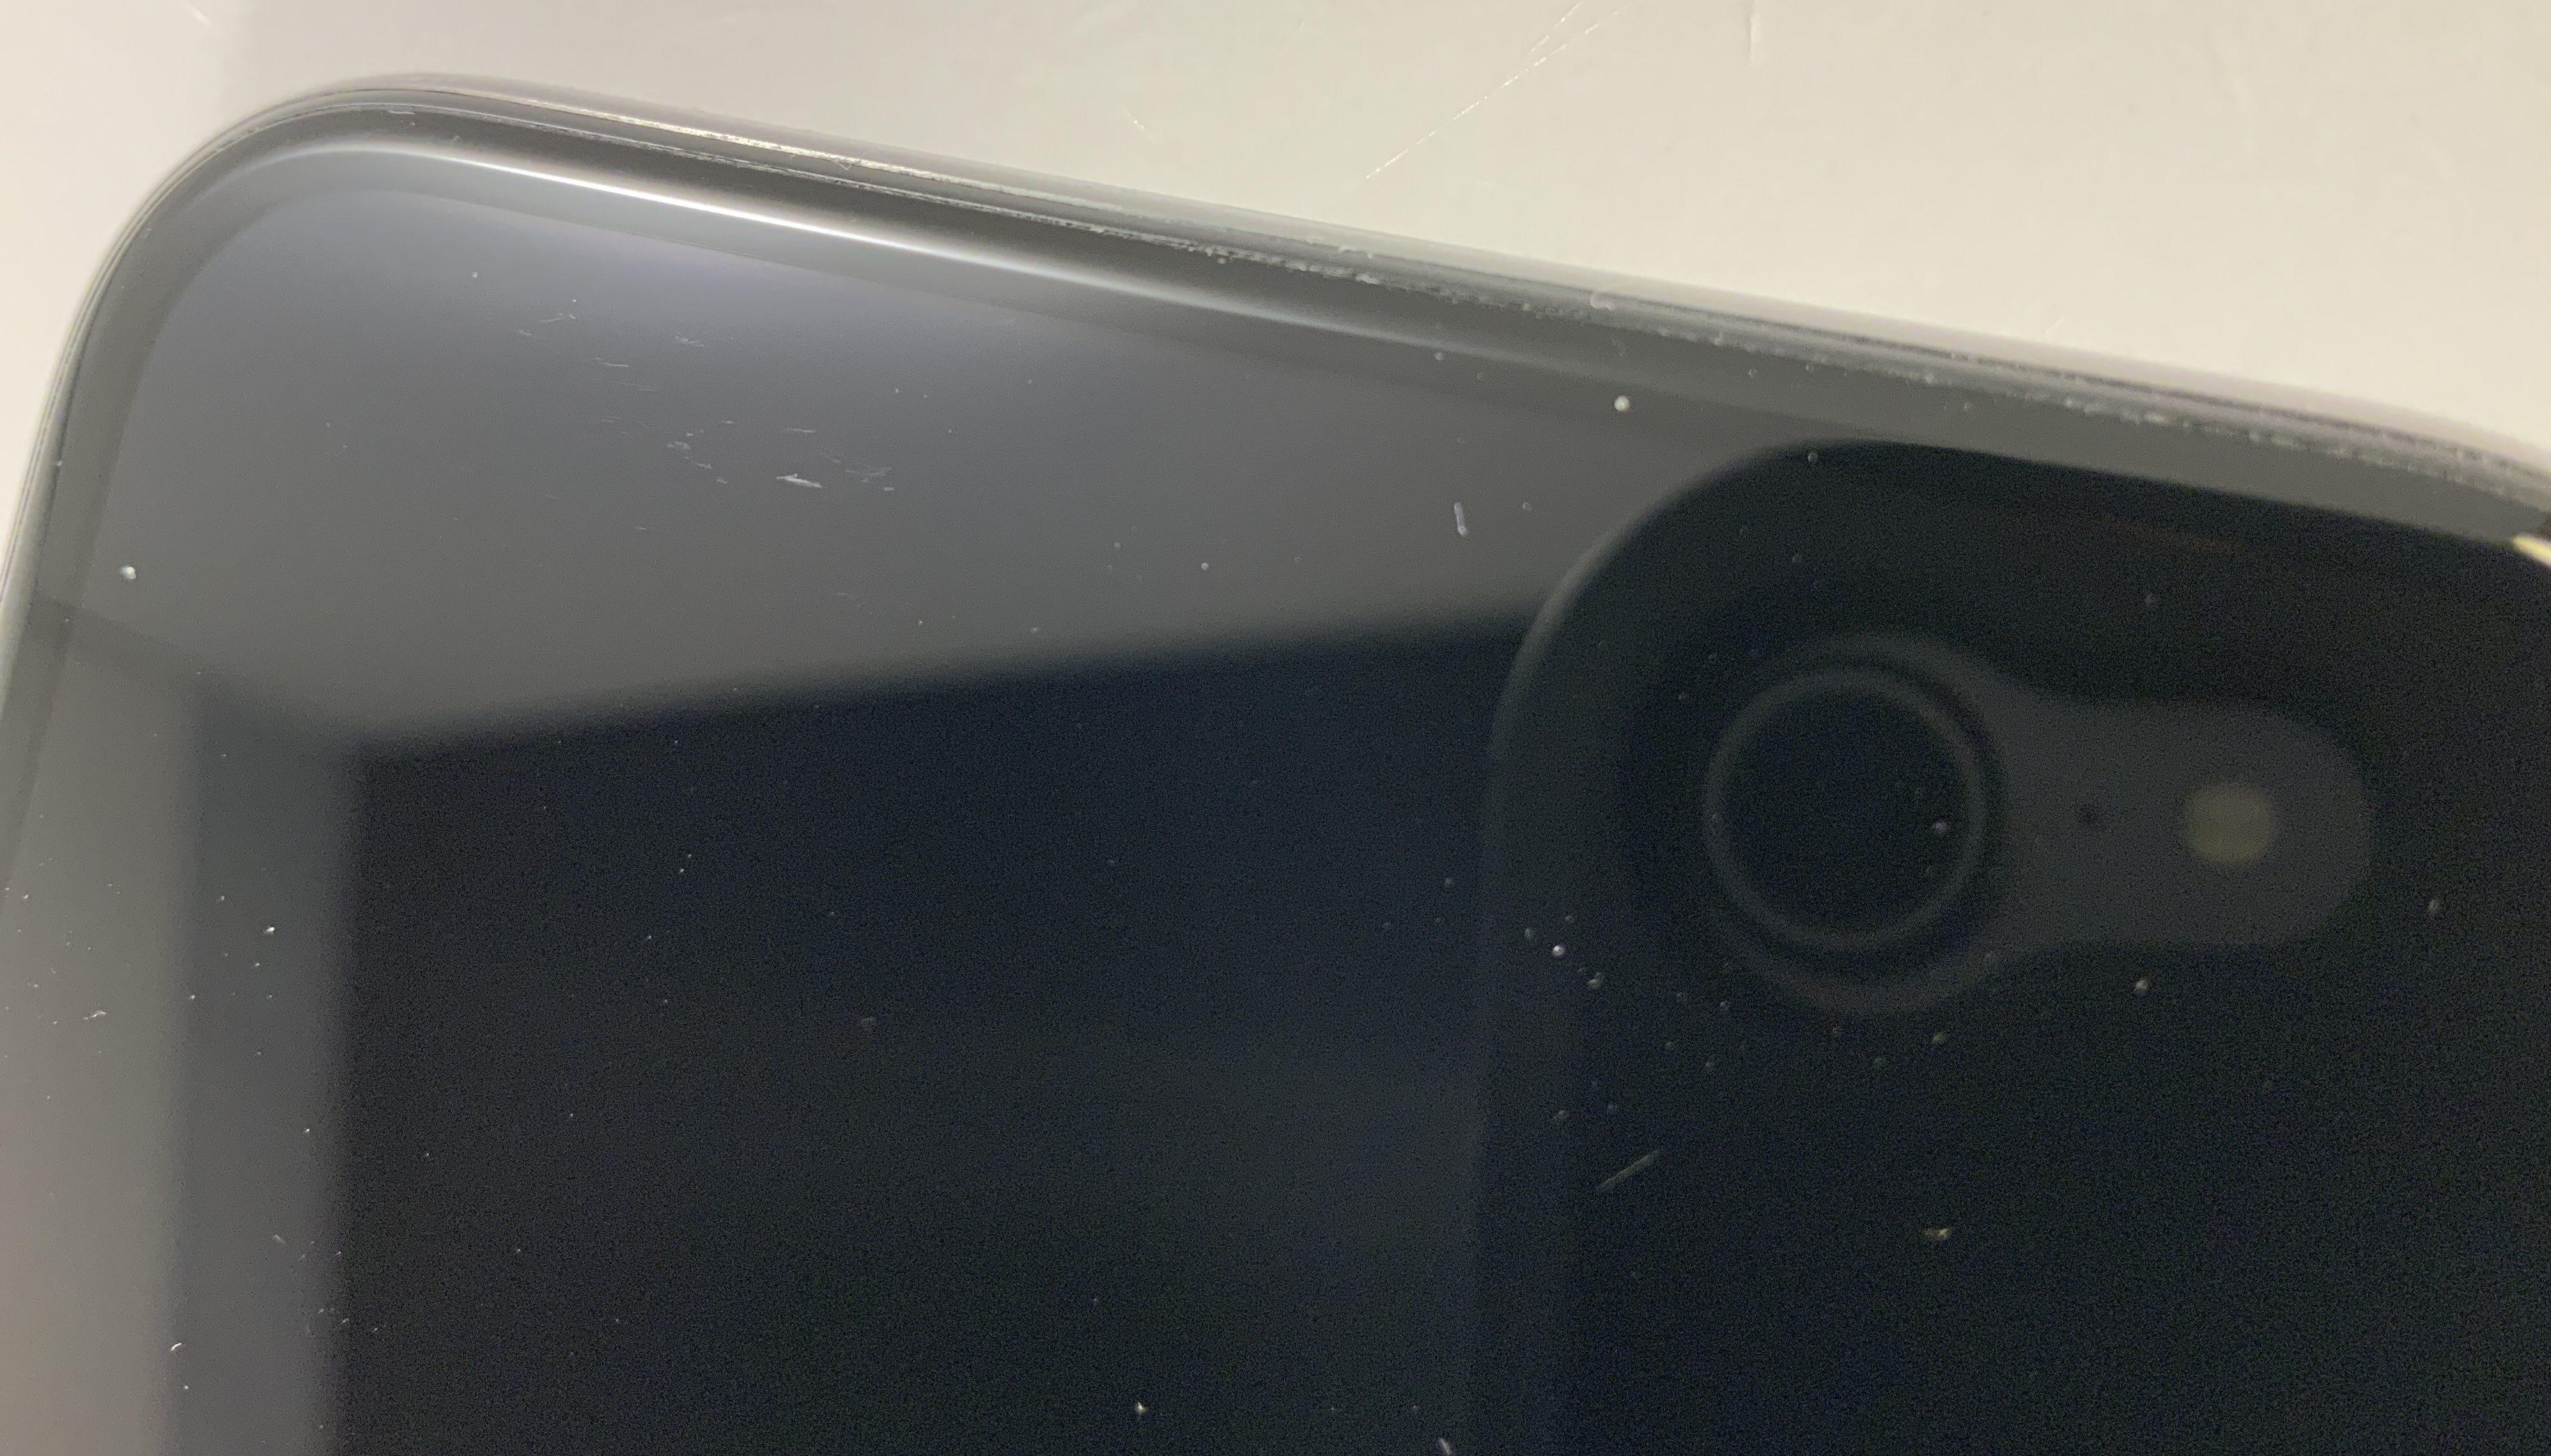 iPhone X 64GB, 64GB, Space Gray, immagine 2